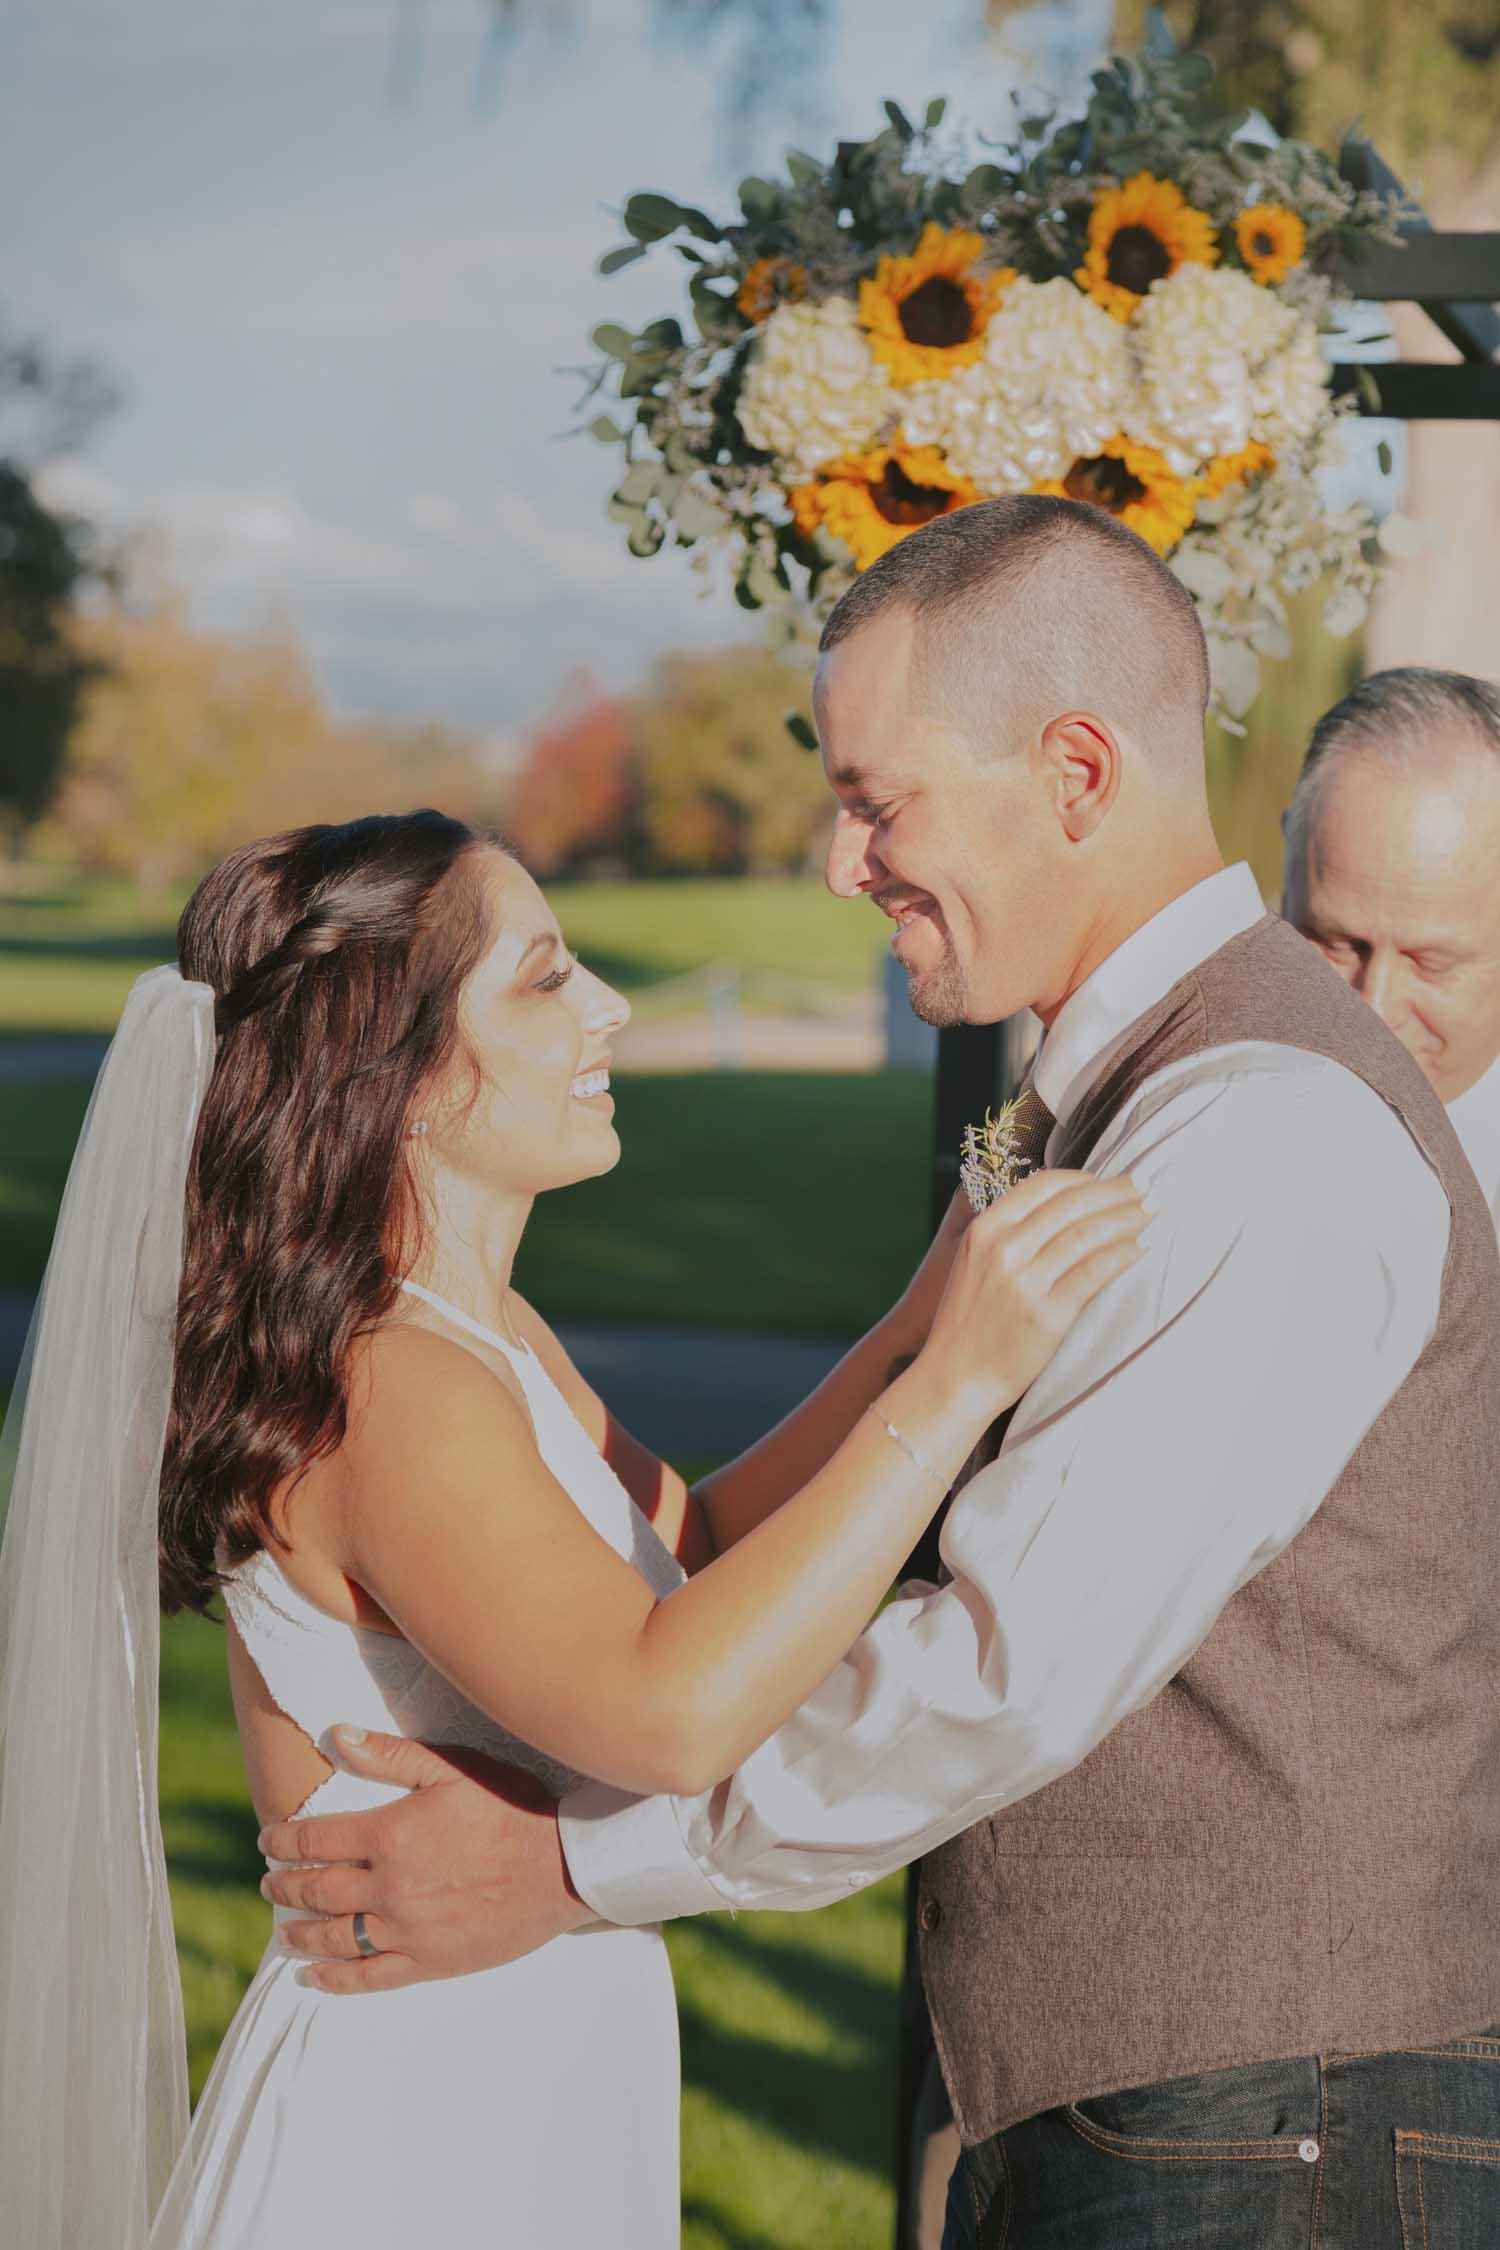 Bonnie-Scott-Rustic-Wedding-Chico-Ca-Butte-Creek-Country-Club2Bonnie-Scott-Rustic-Wedding-Chico-Ca-Butte-Creek-Country-Club6.jpg